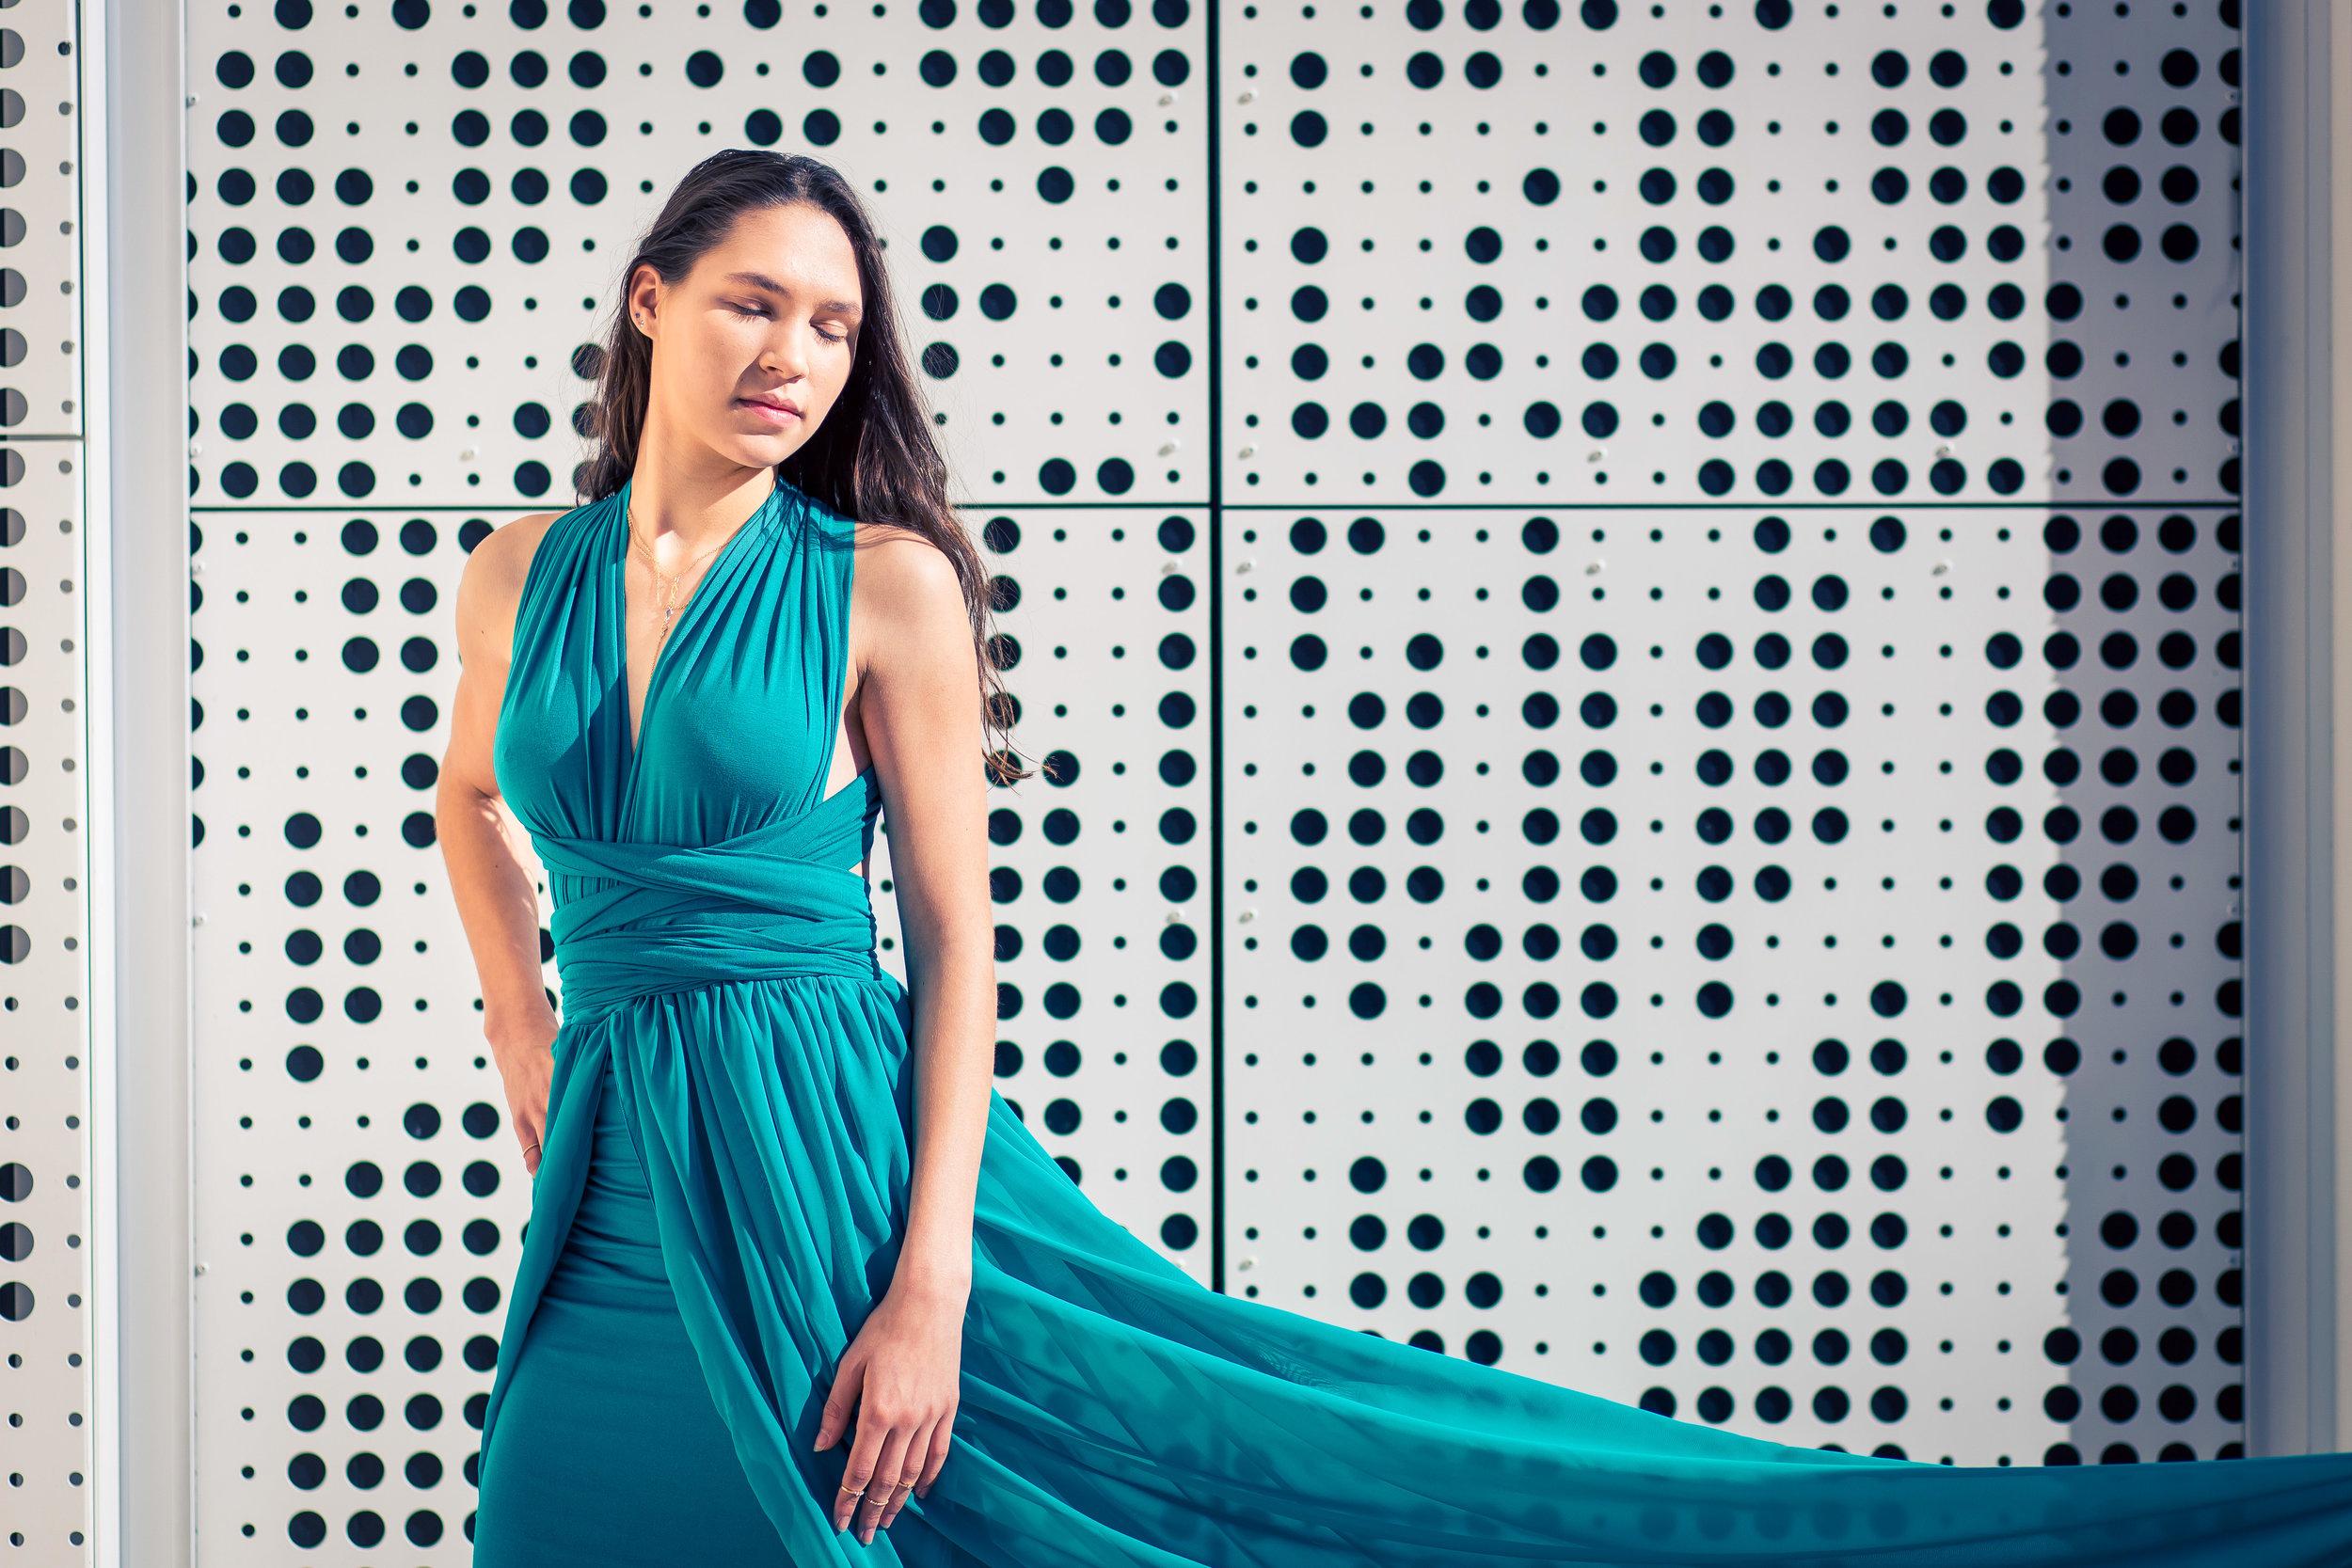 senior portrait of a girl in a long blue dress